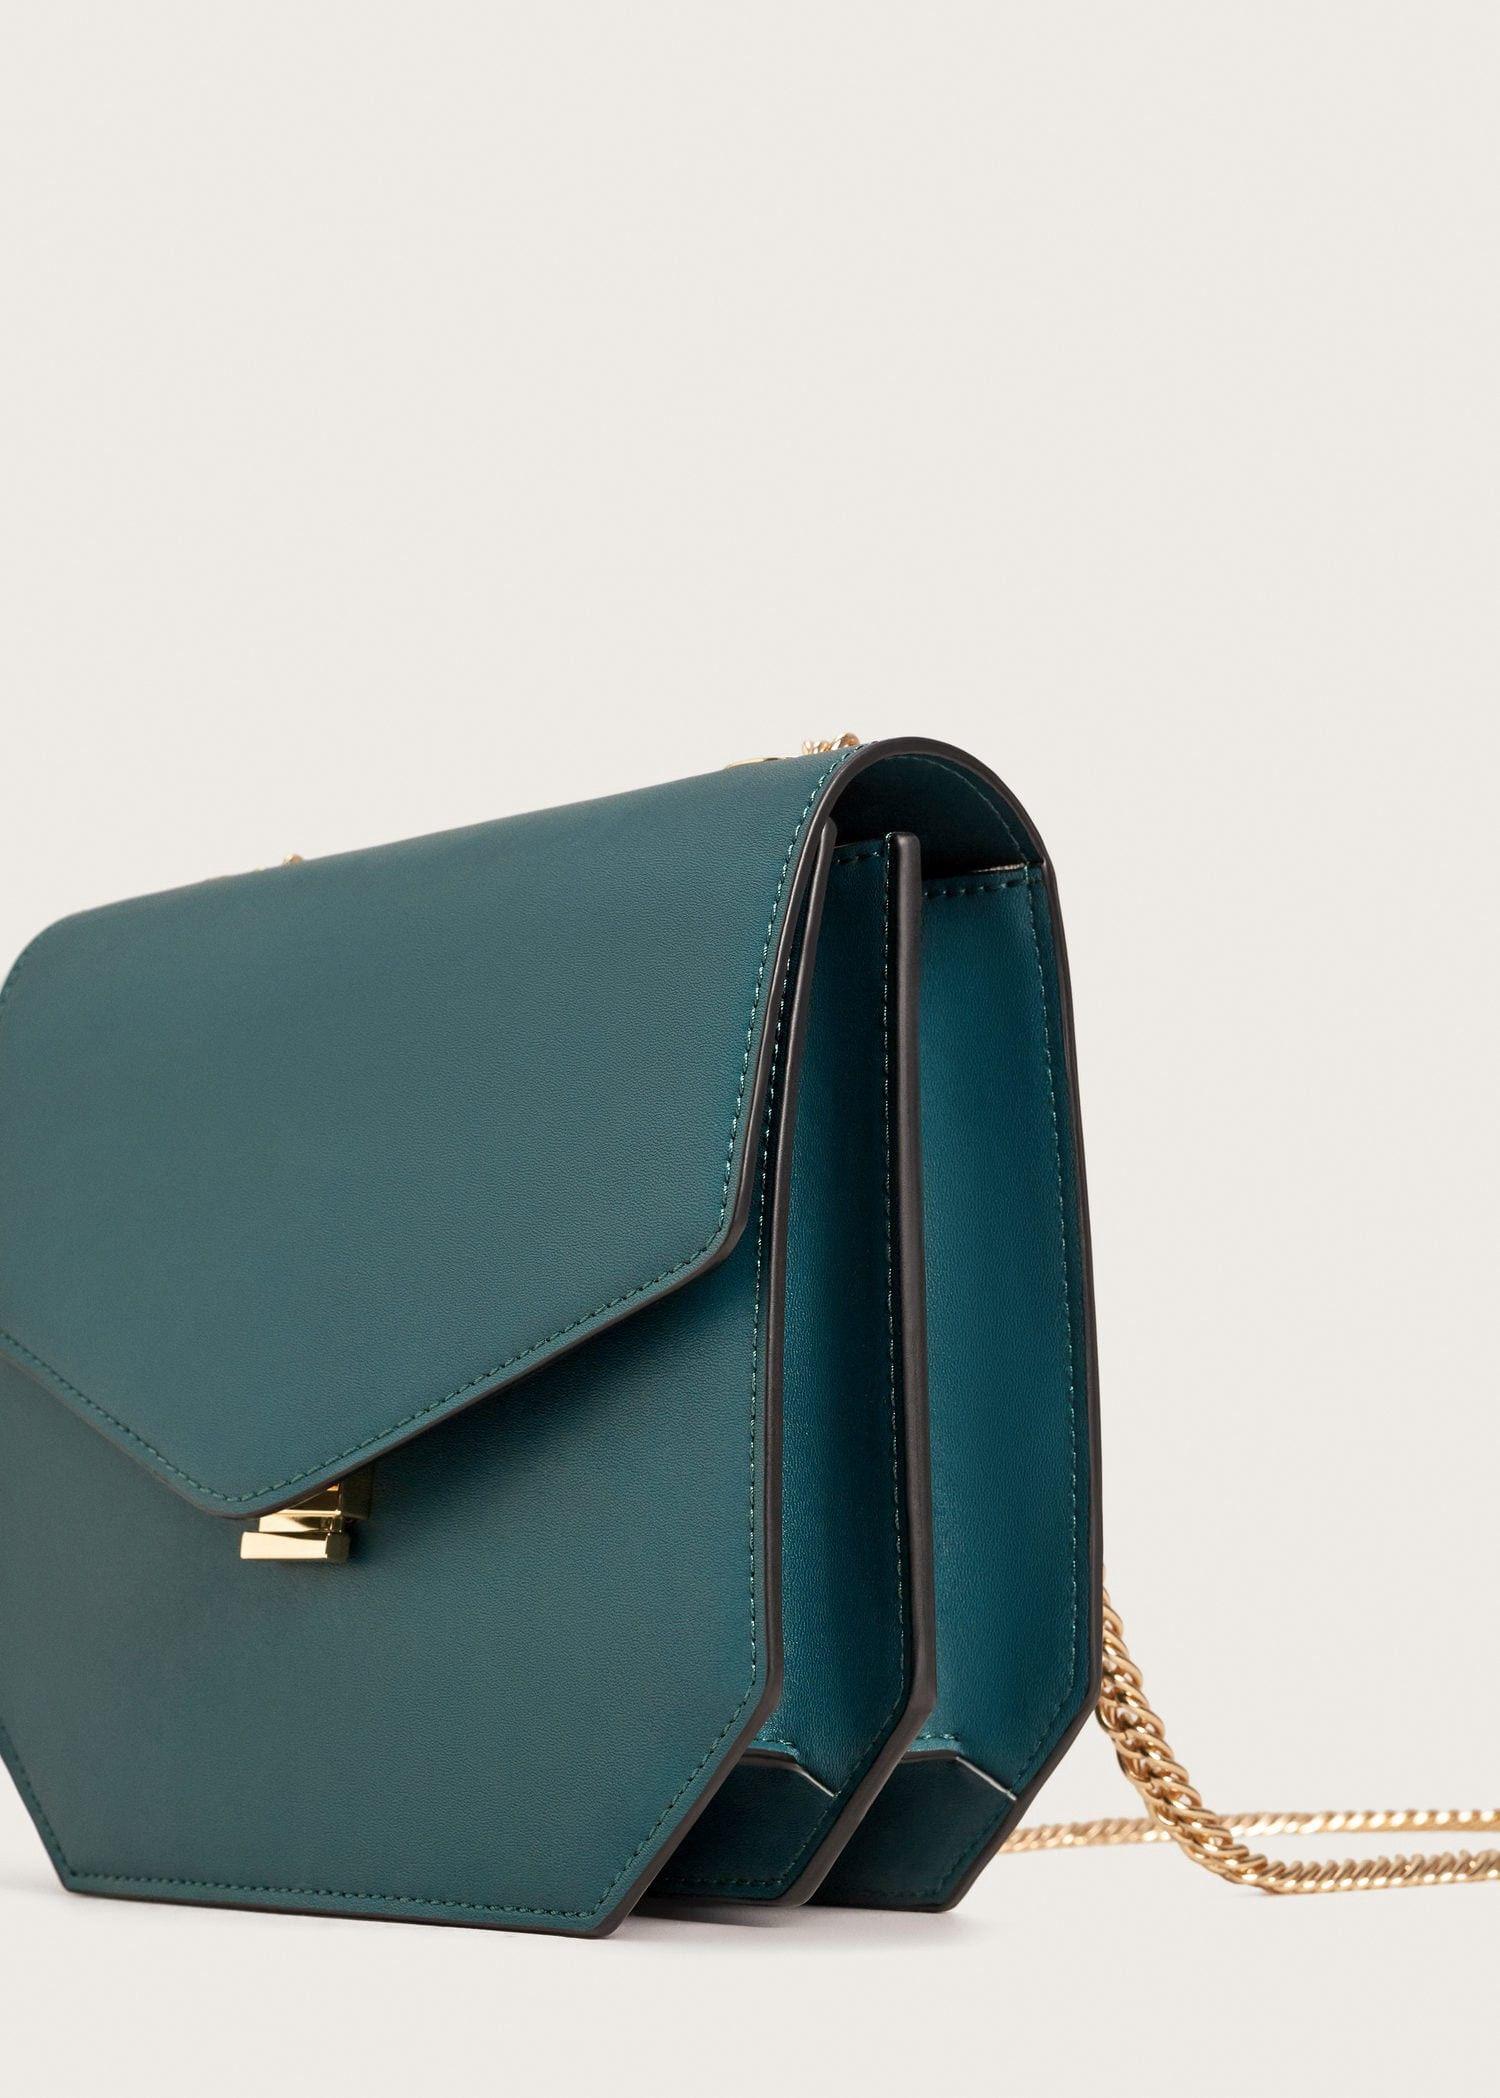 dcd367886fa9 Mango Chain Cross Body Bag - Green One Size